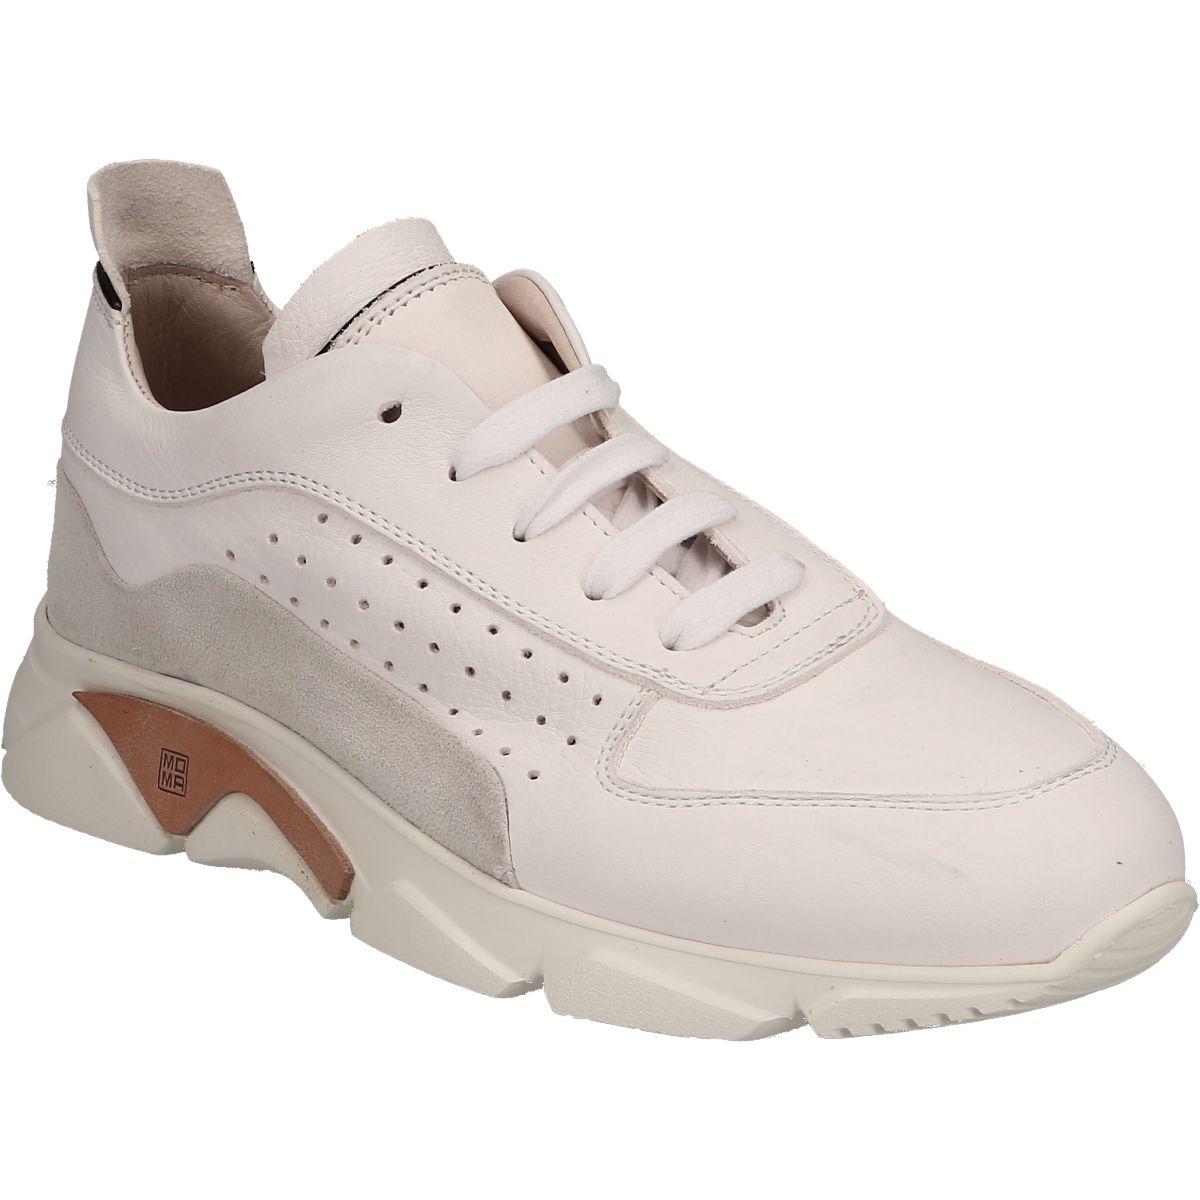 Moma 4AS018 CT Herrenschuhe Schnürschuhe im Schuhe Lüke